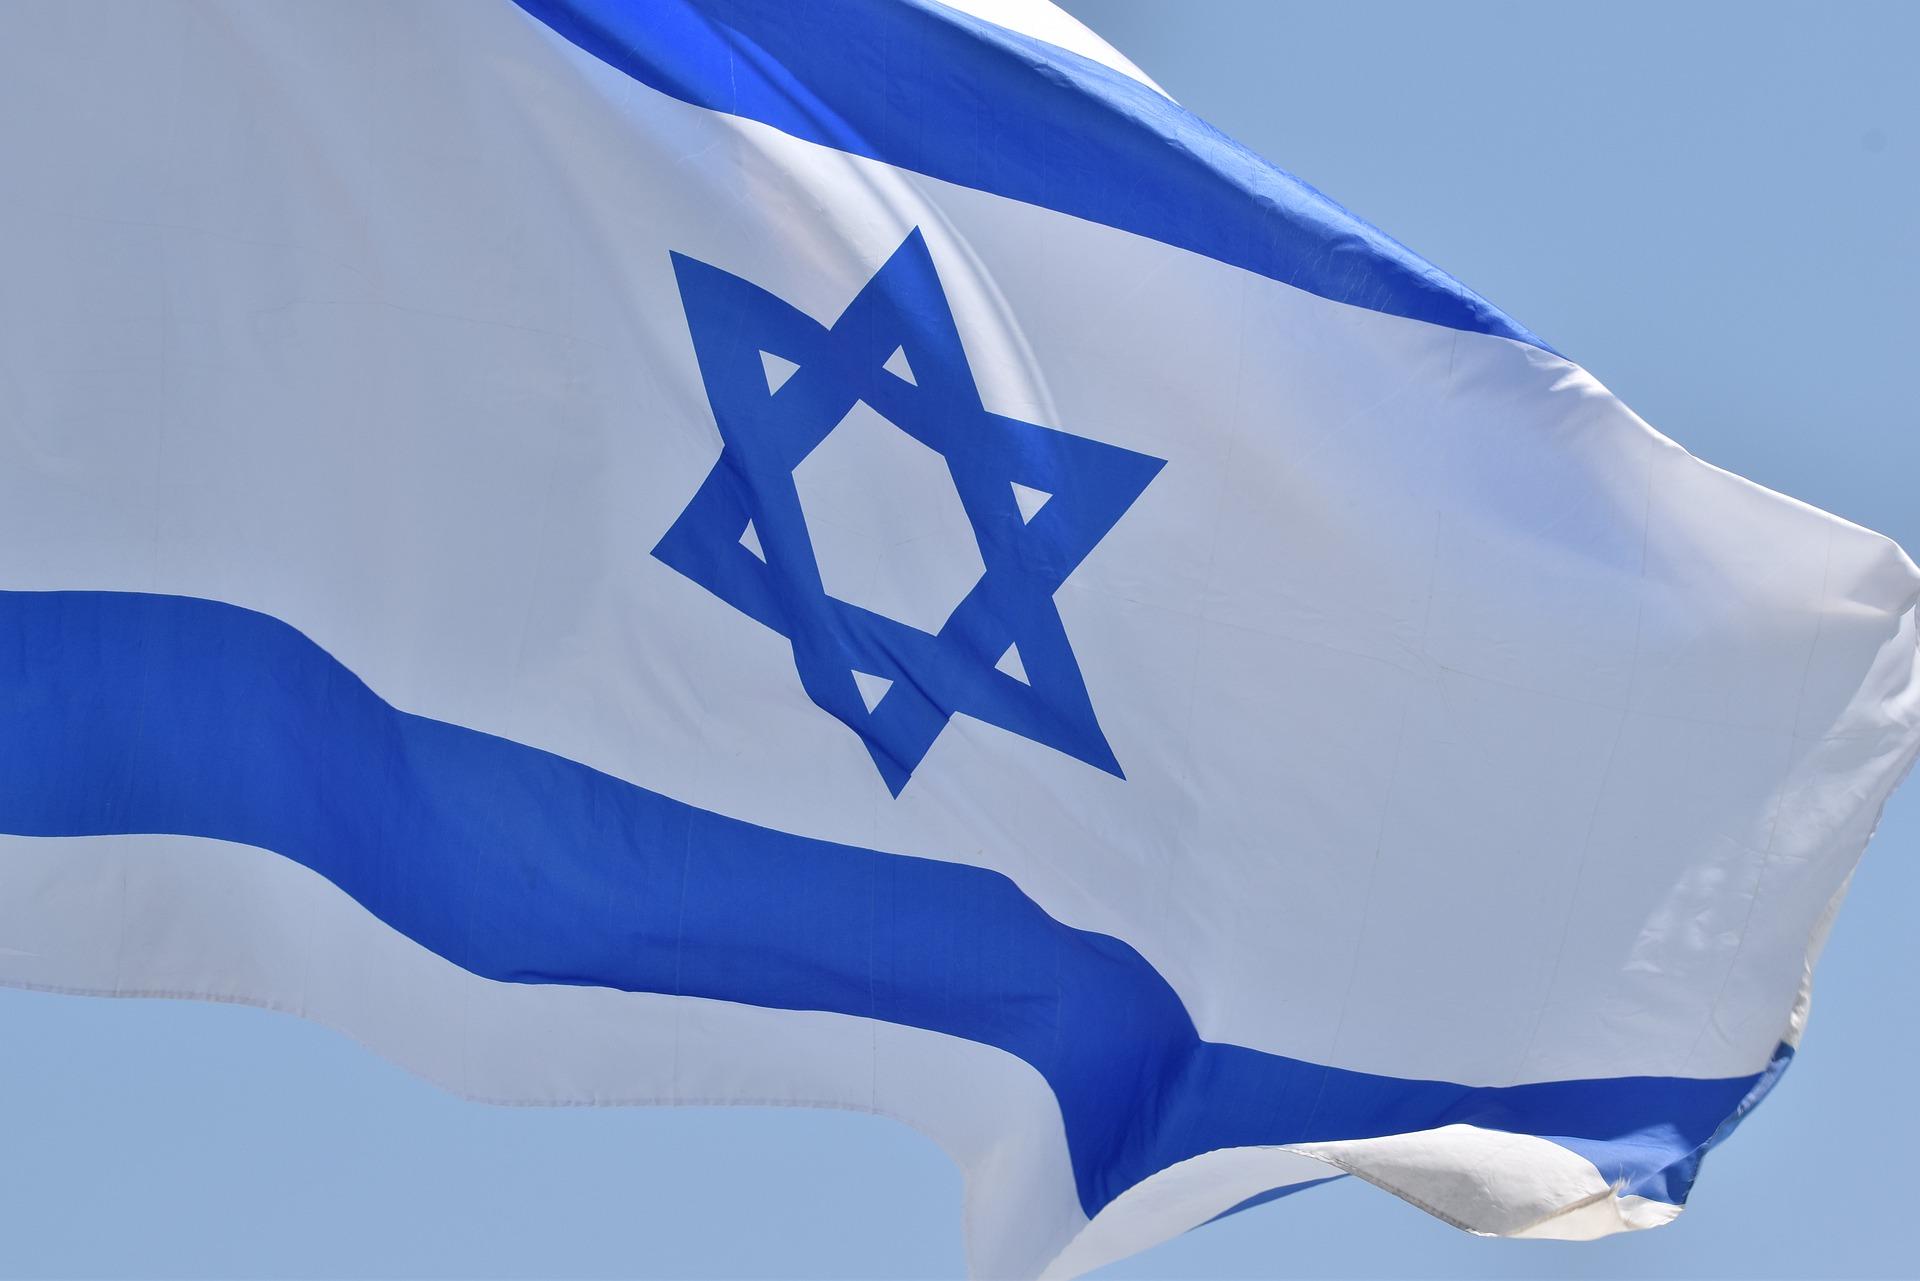 Read more about the article 締造1/5諾貝爾得主的民族!從《猶太媽媽這樣教思考》談教導部屬思考的3步驟